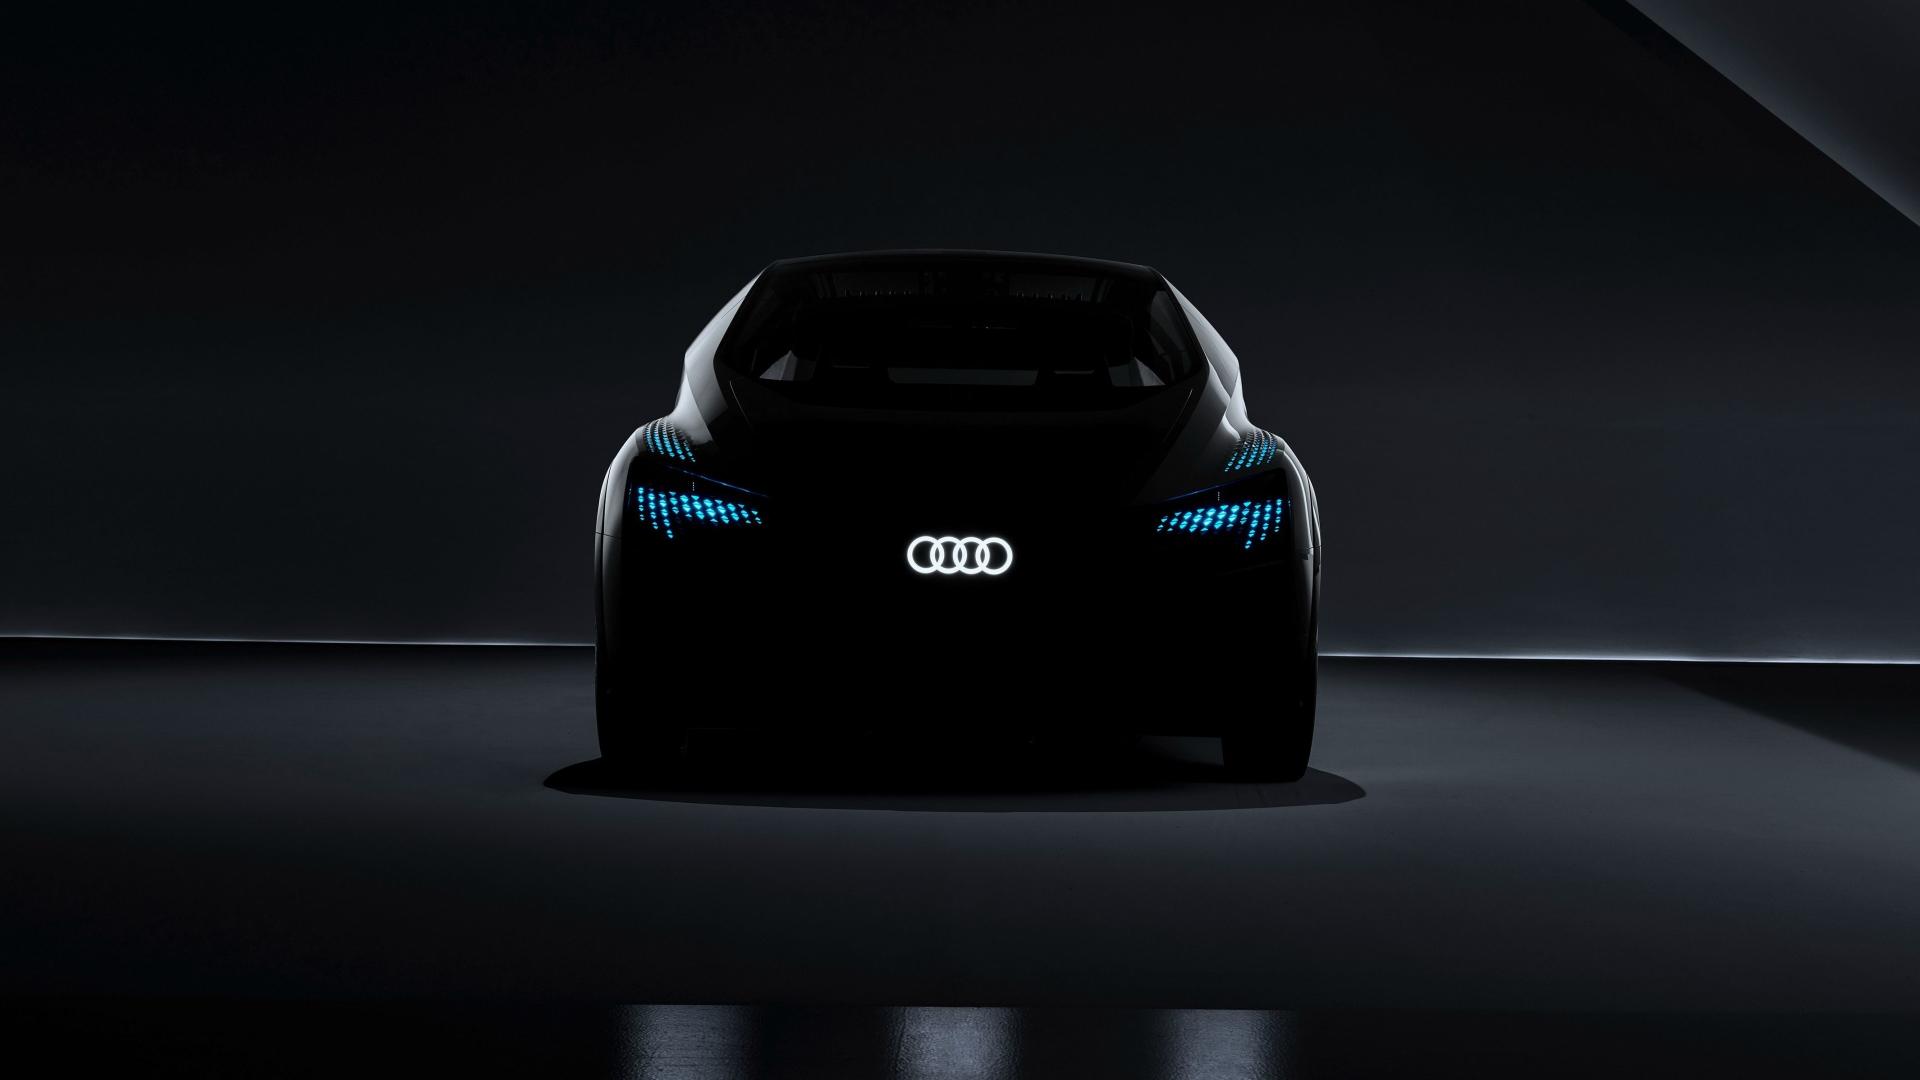 1920x1080 Audi AI ME 1080P Laptop Full HD Wallpaper, HD ...